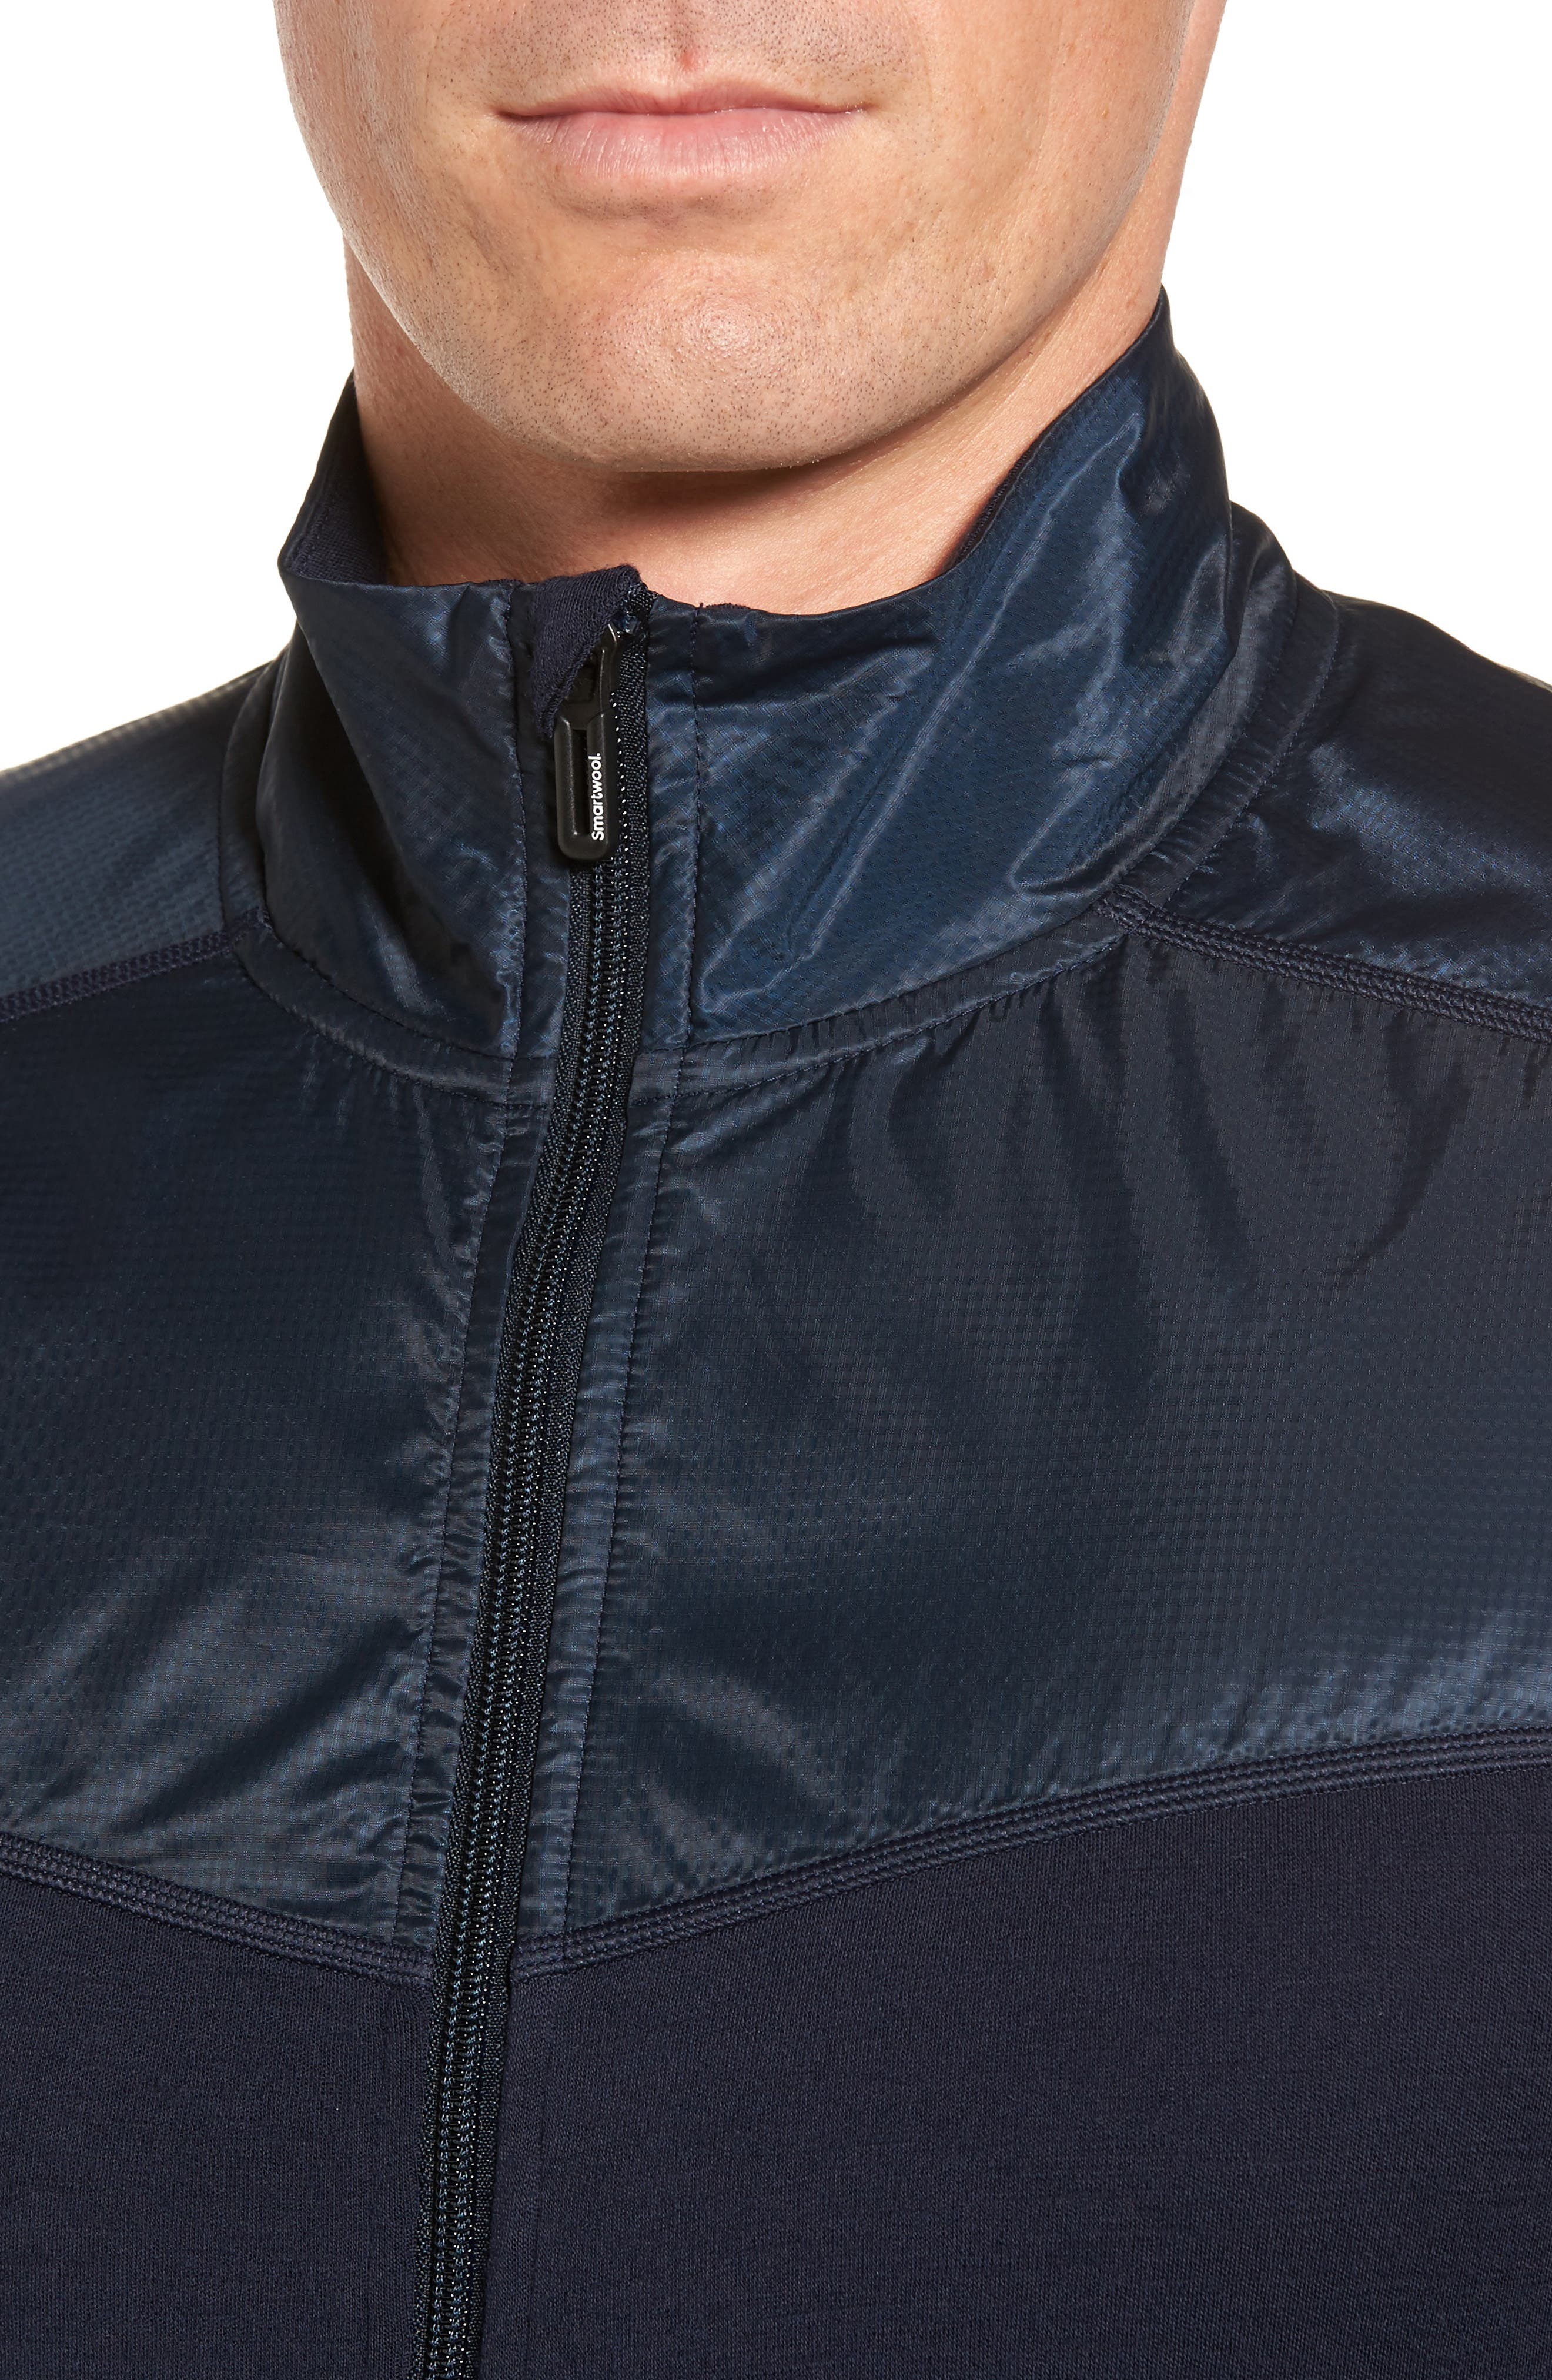 250 Sport Merino Wool Zip Jacket,                             Alternate thumbnail 4, color,                             Deep Navy